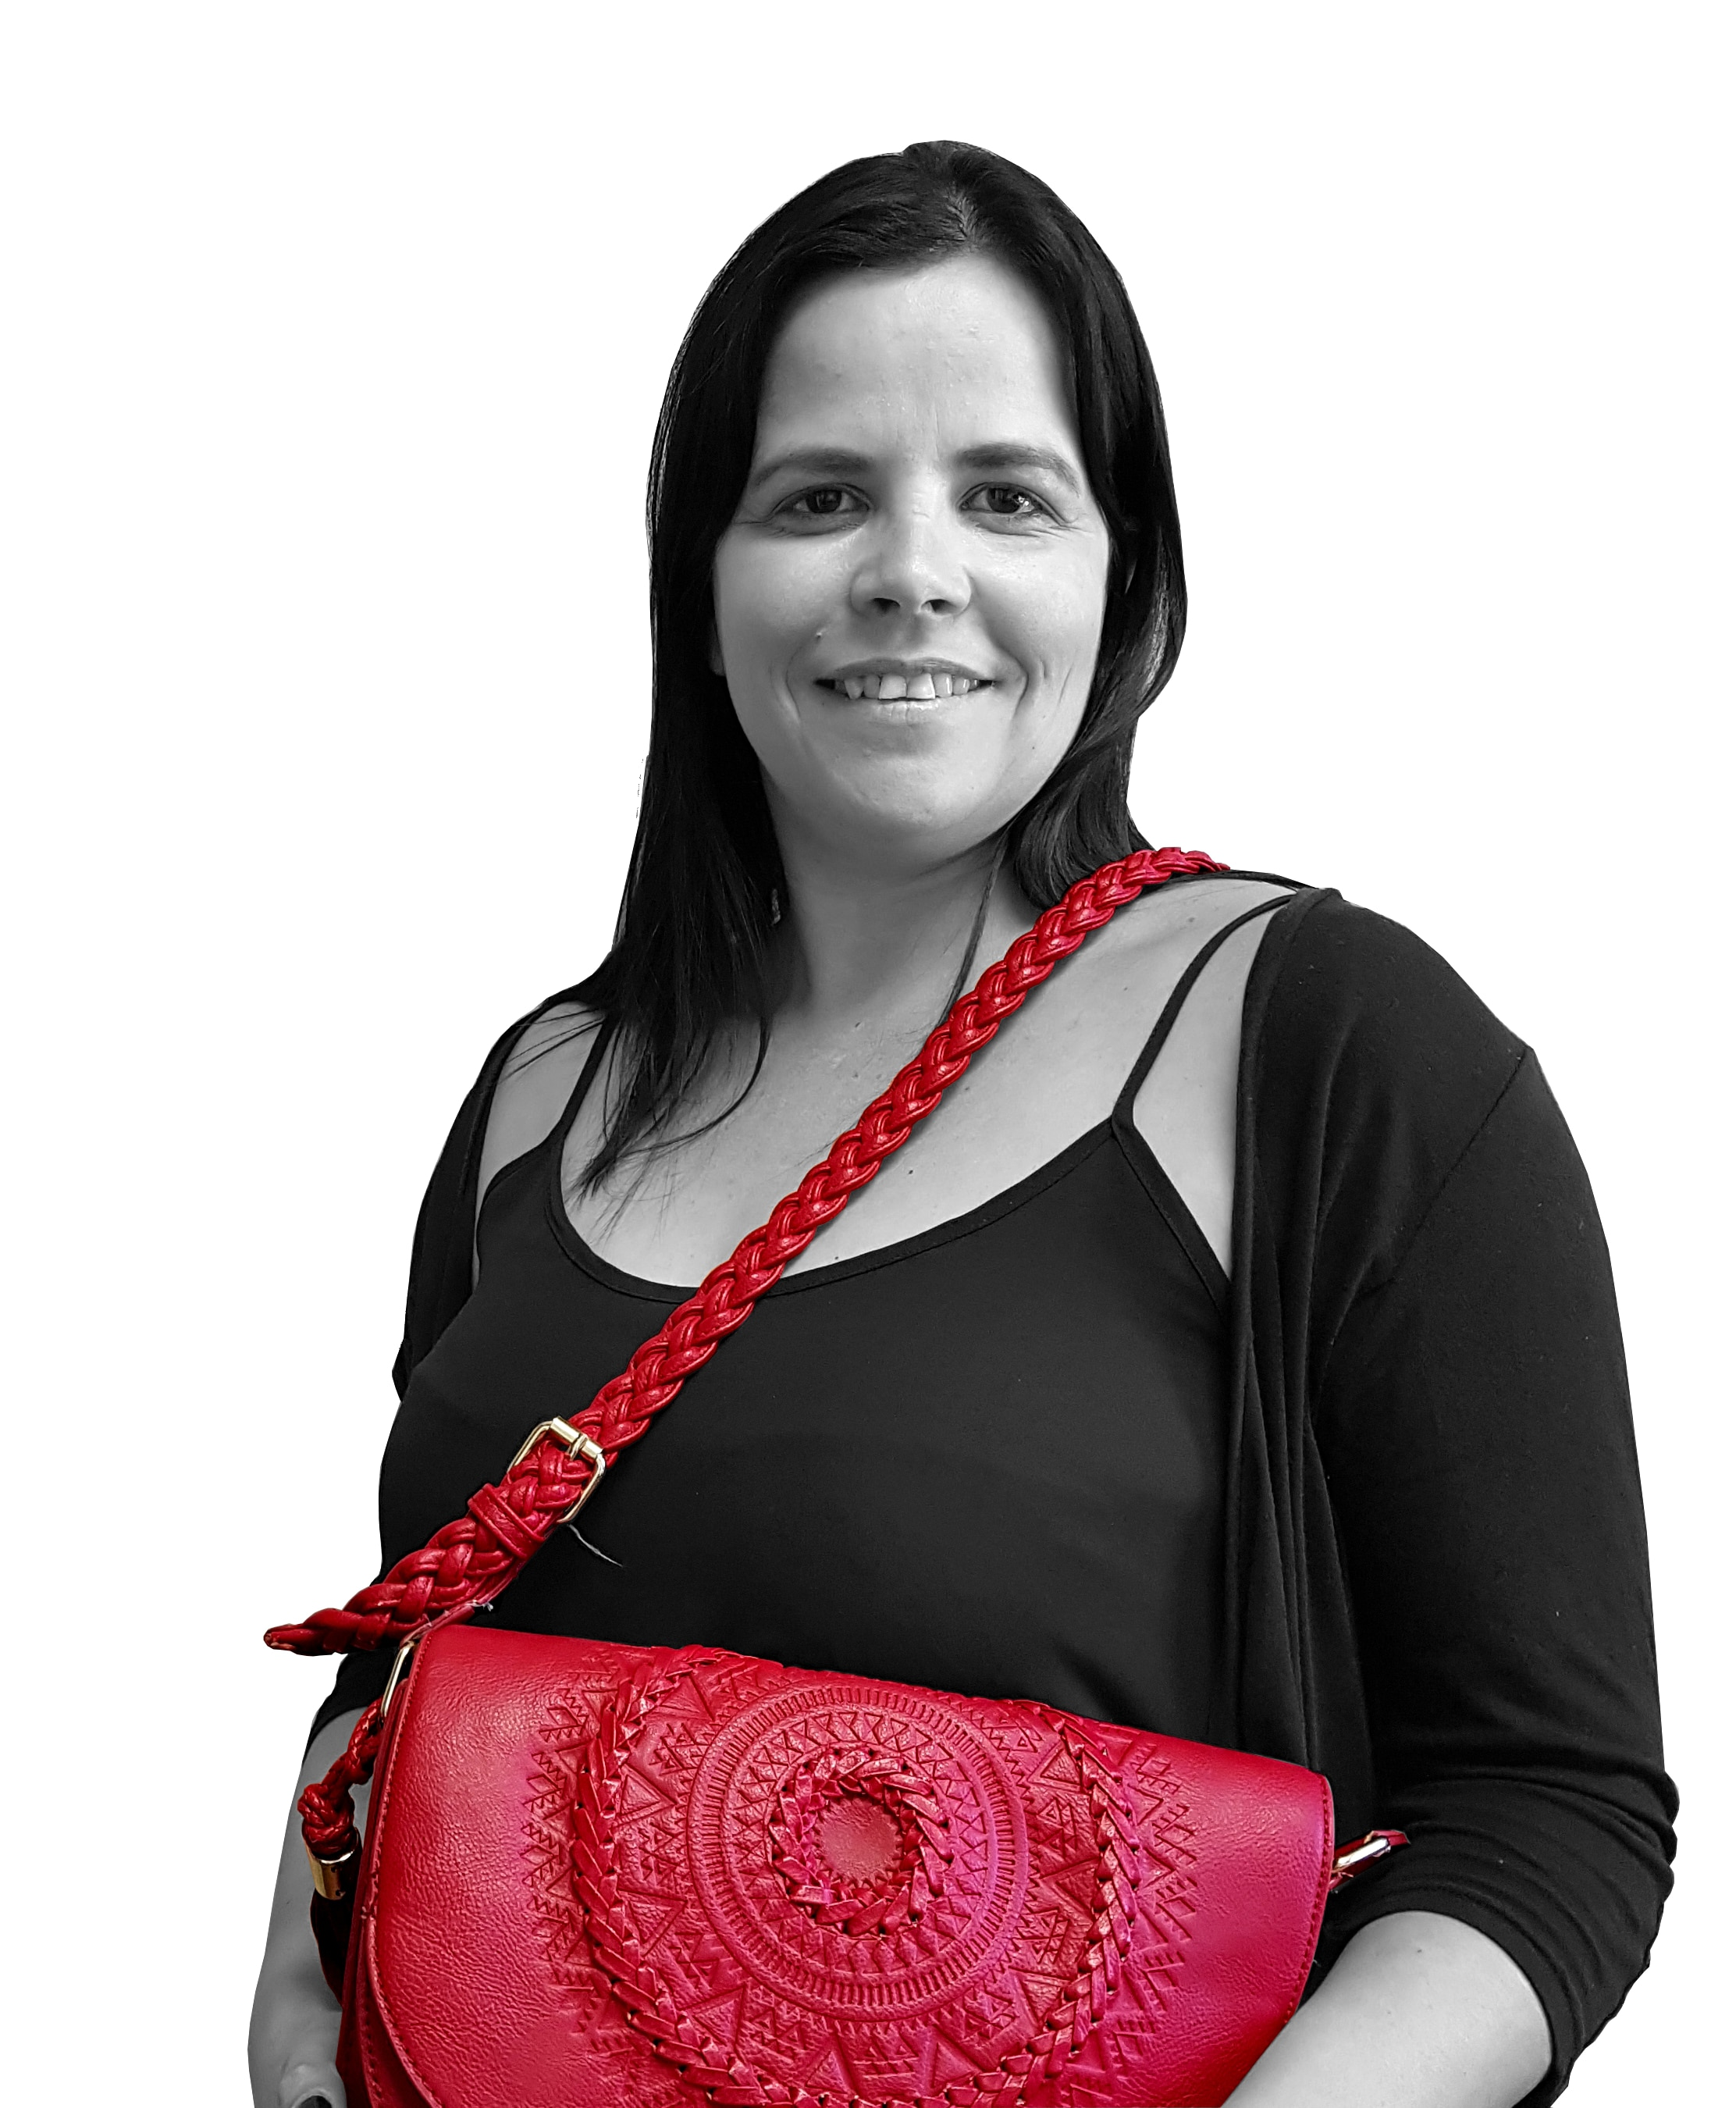 Elrine de Villiers